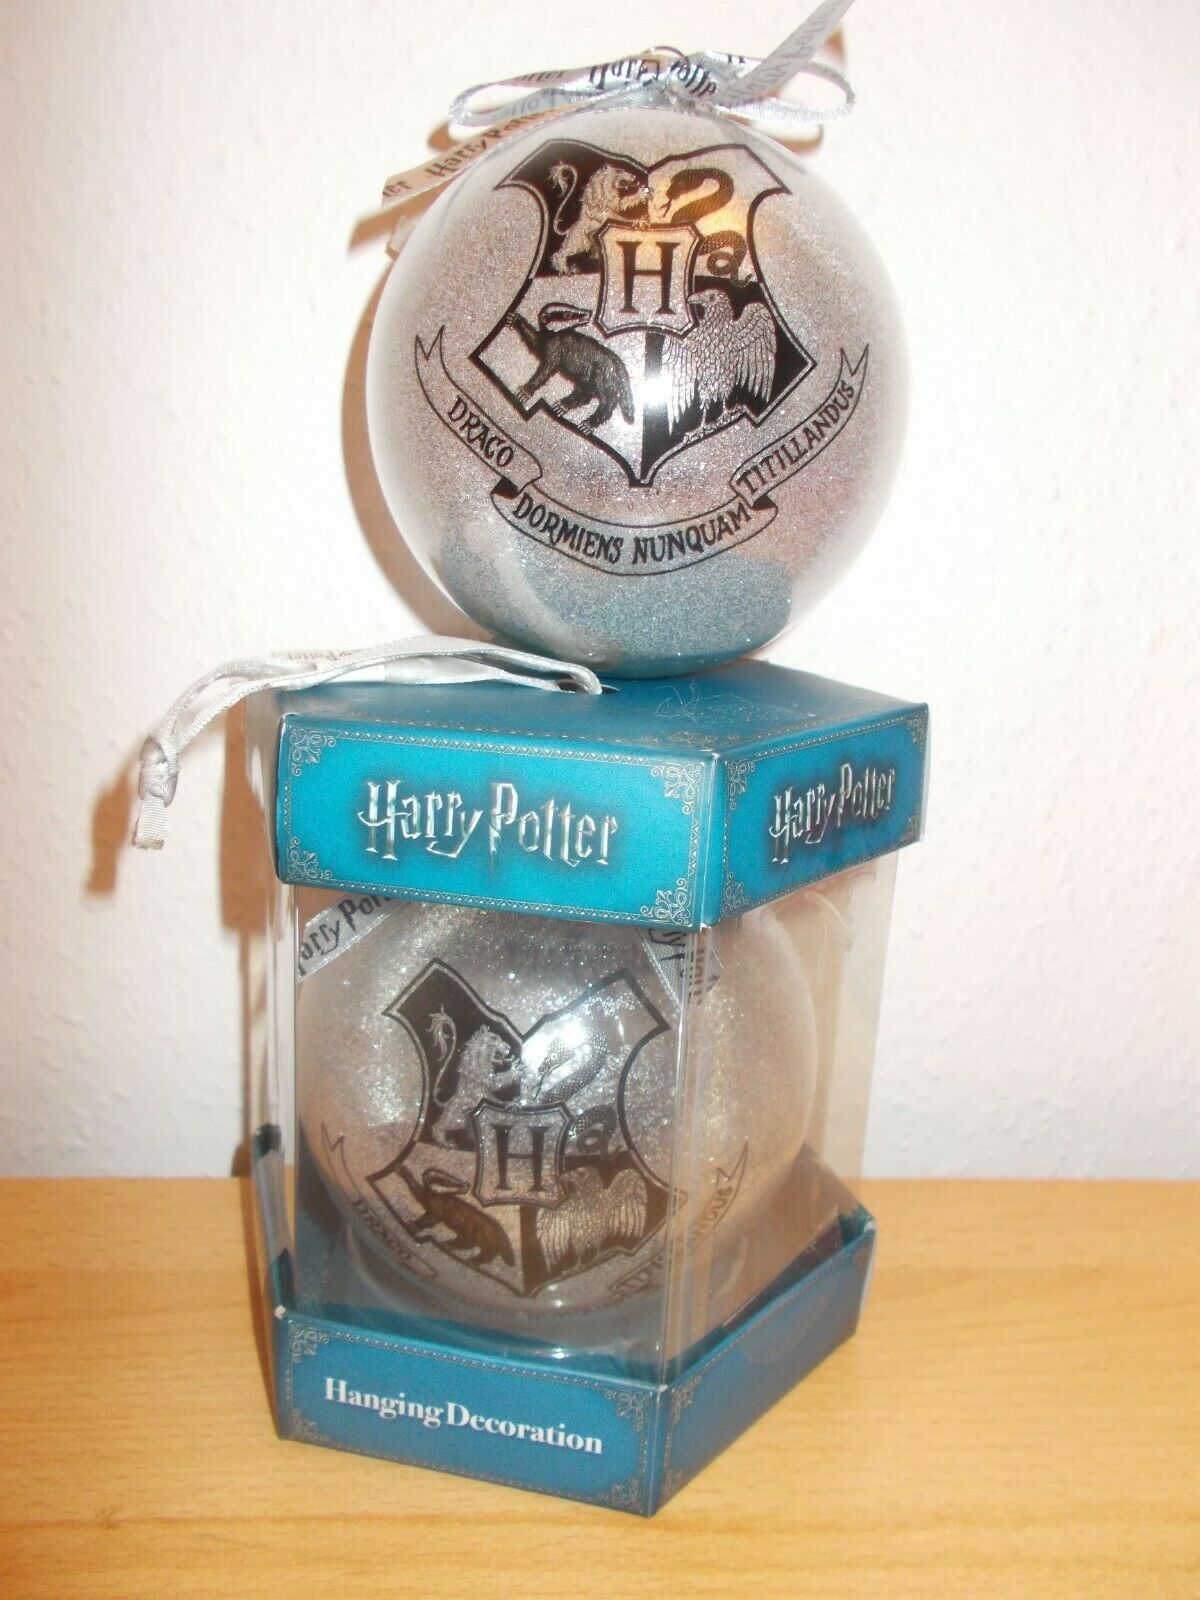 Harry Potter Weihnachtskugel Dekoration Hogwarts Christbaum Schmuck Kugel